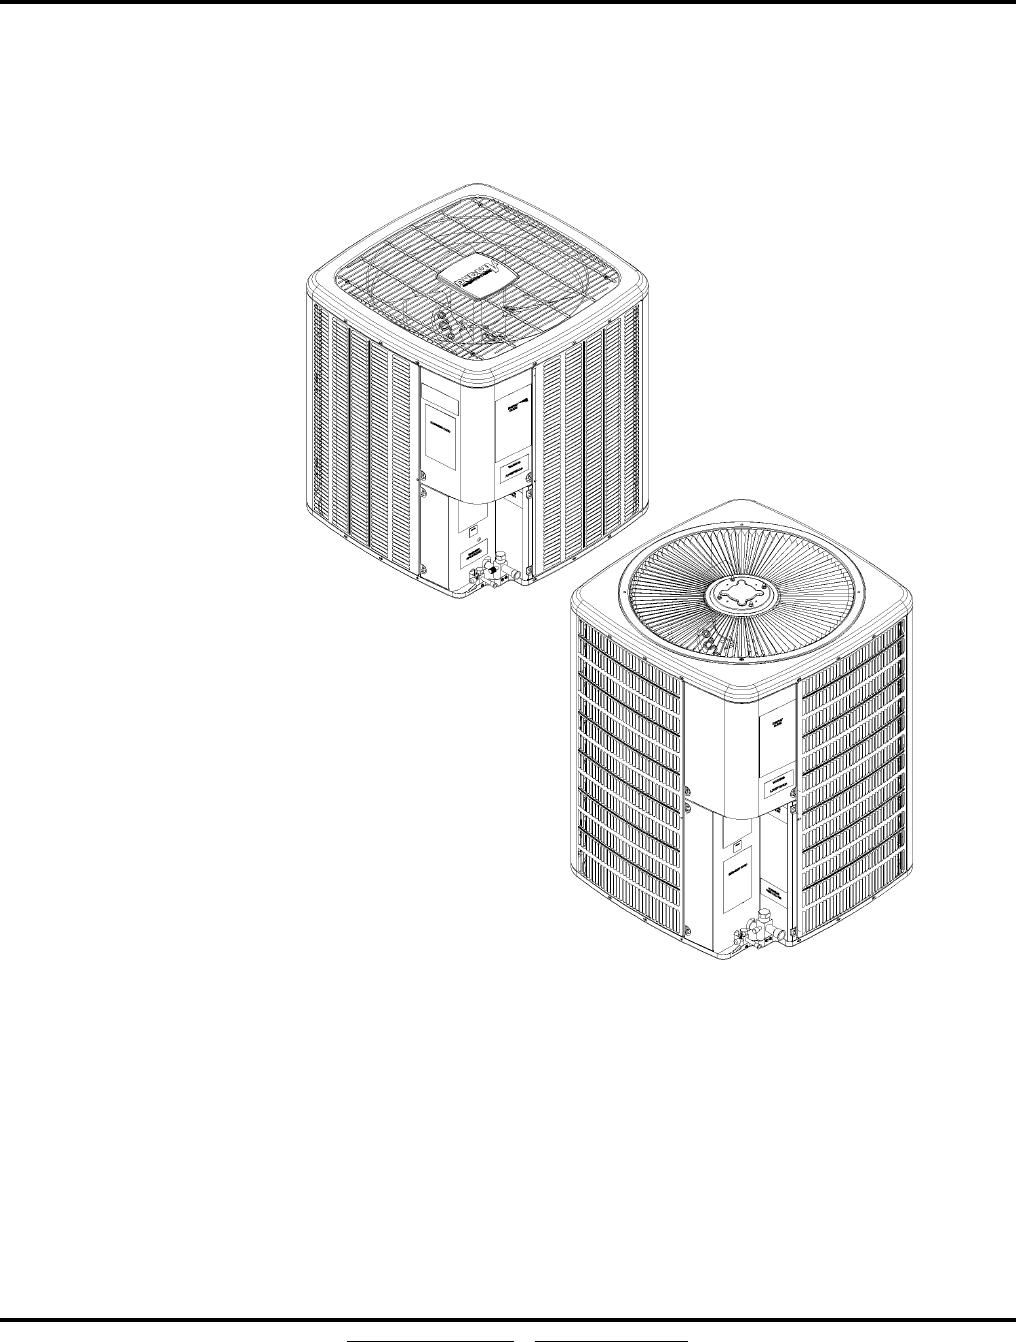 Goodman Mfg Remote Condensing Units Gsc13 Users Manual Rpt